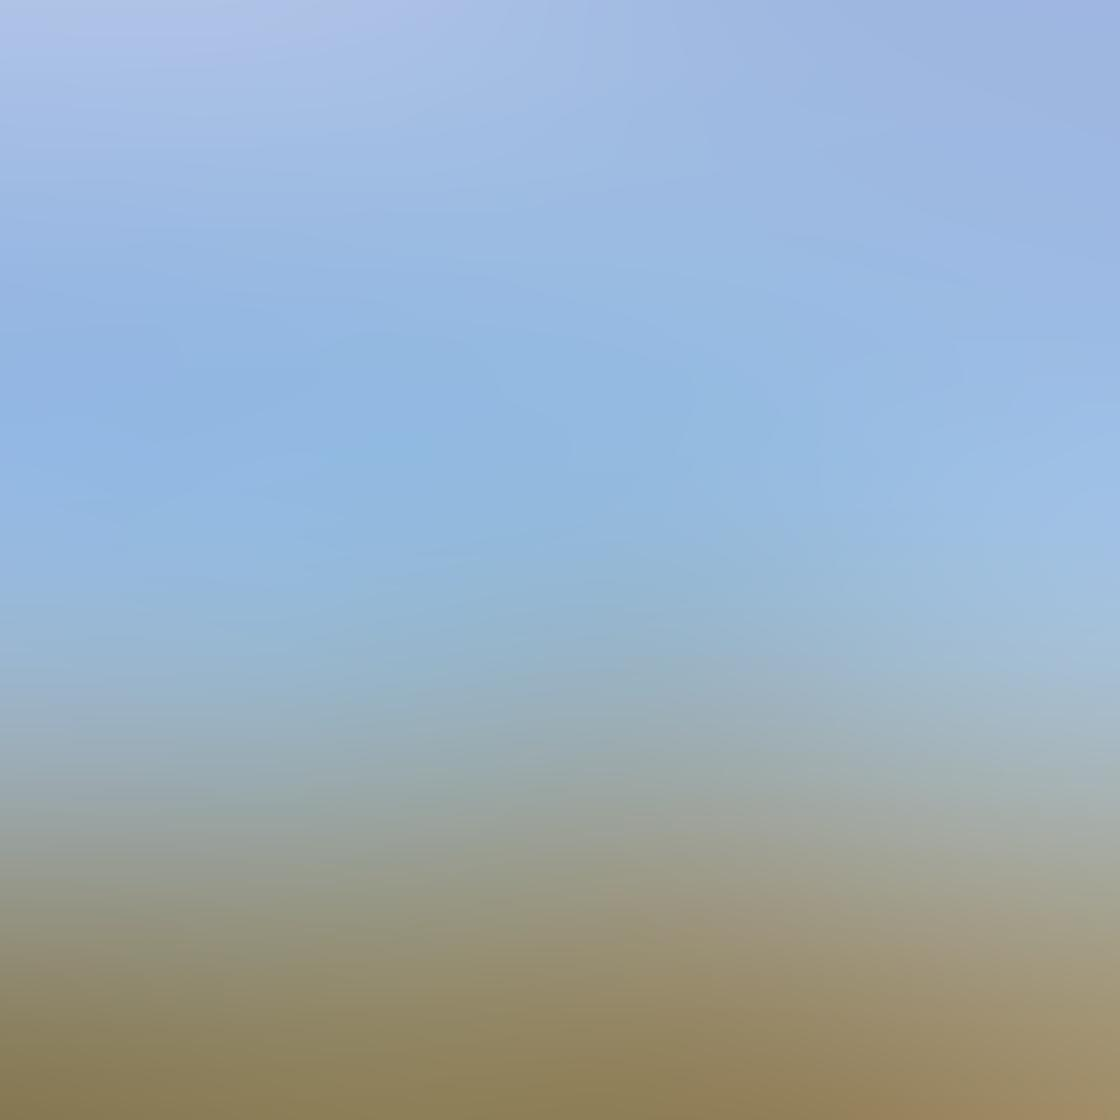 Minimalist Landscape iPhone Photos 4